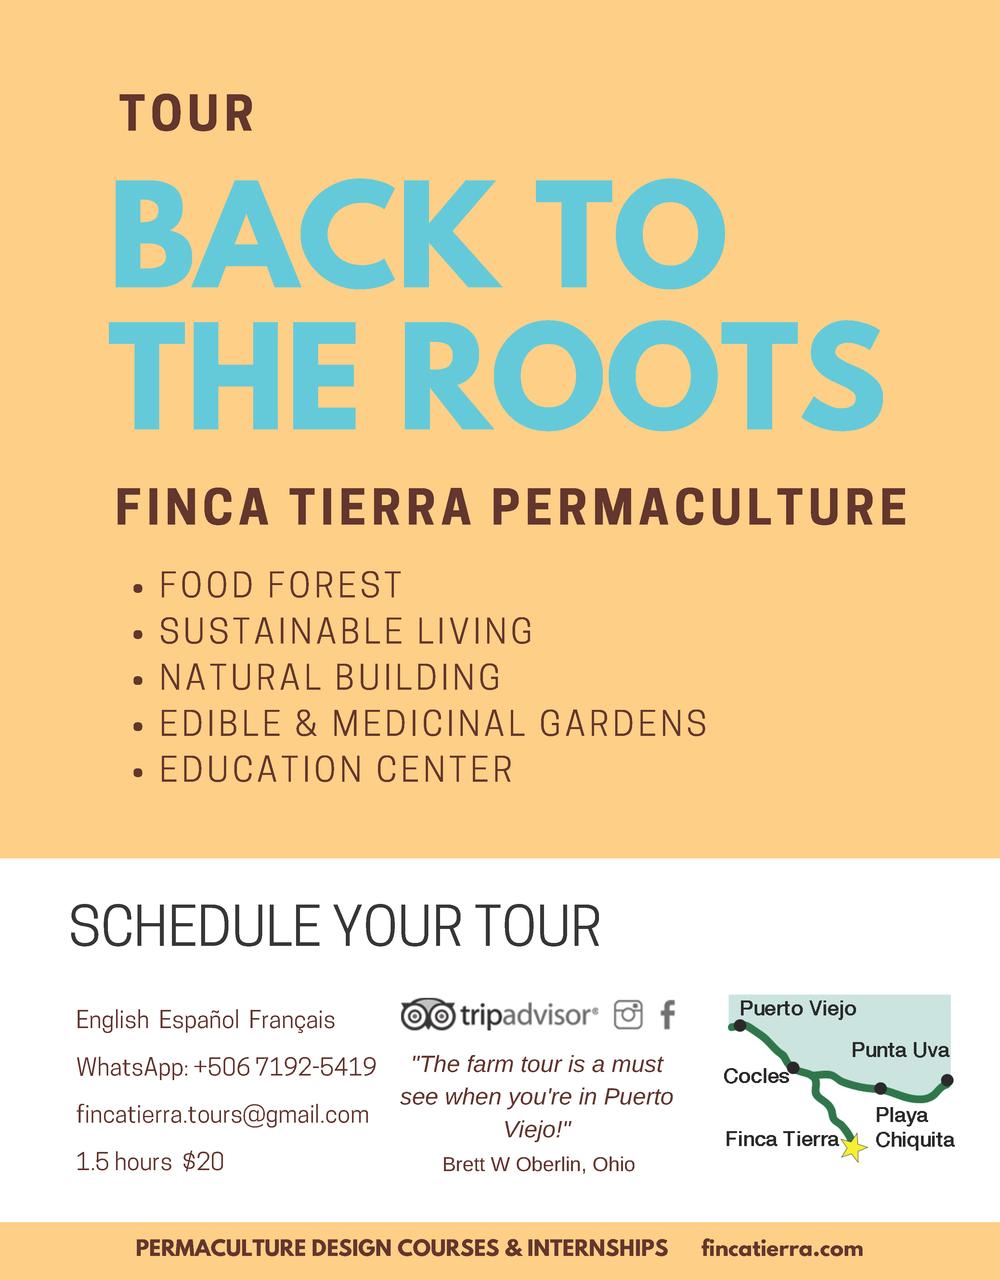 Permaculture farm tour in Puerto Viejo, Costa rica